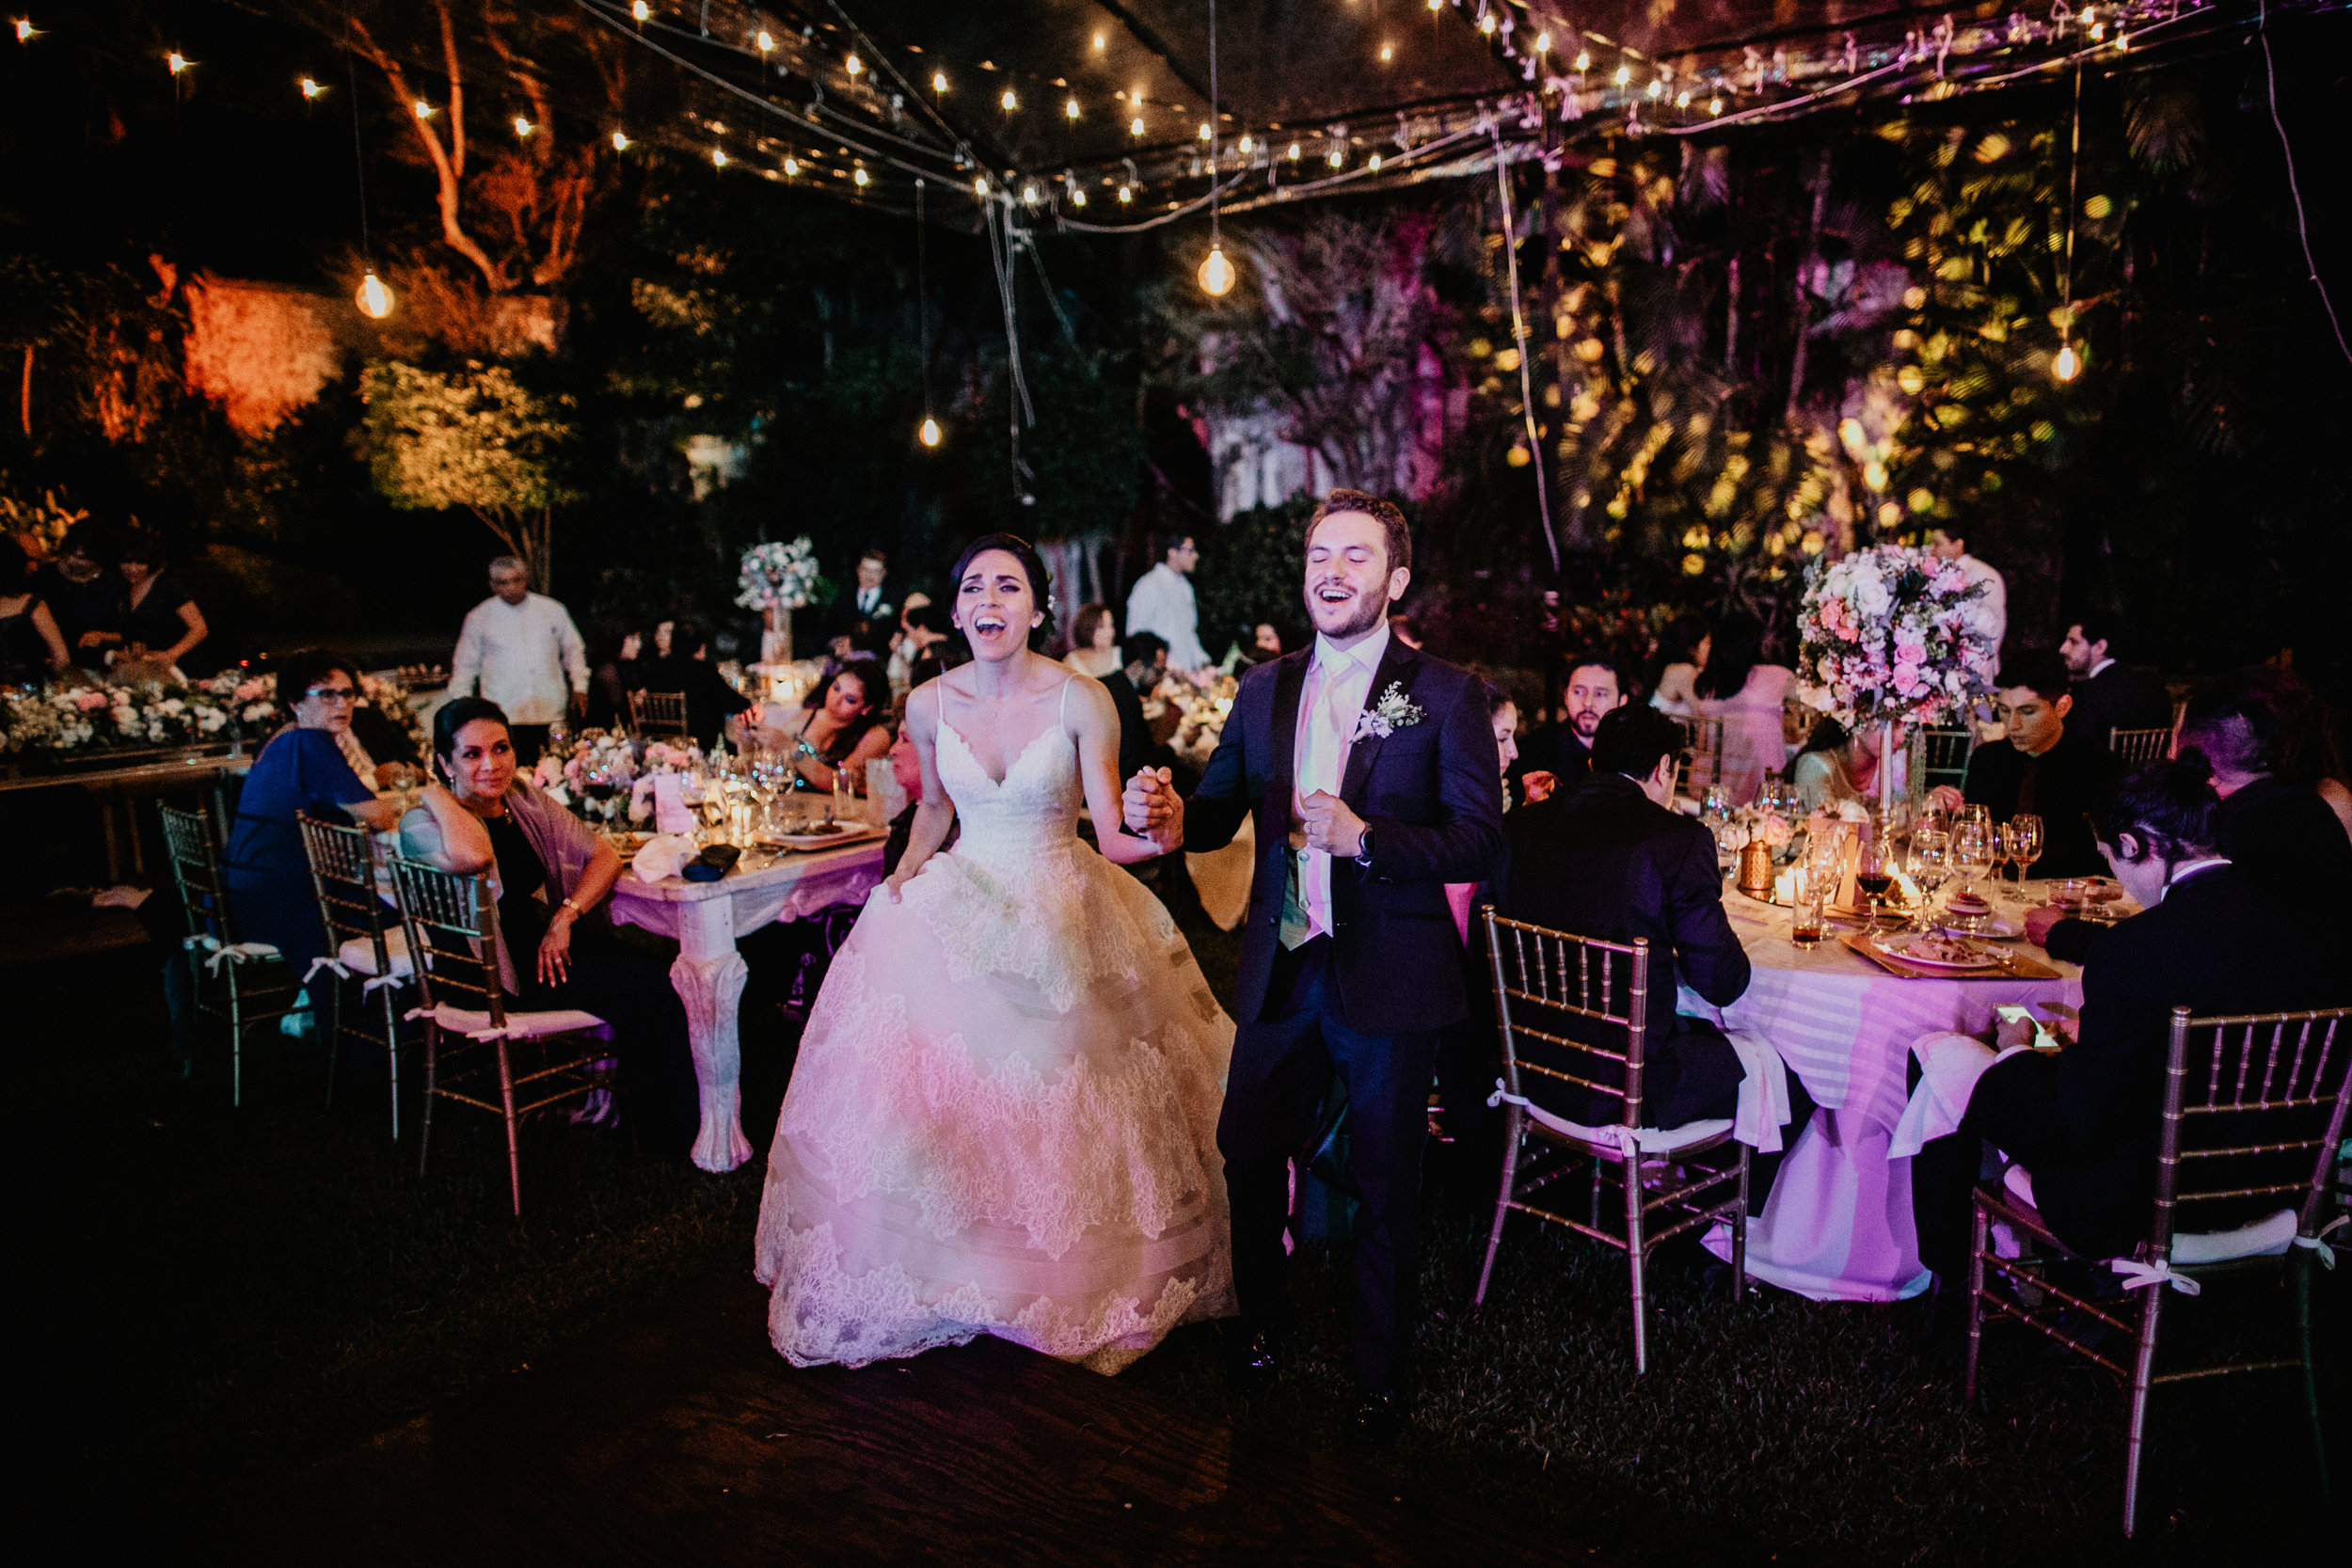 Alfonso_flores_destination_wedding_photography_vanesa_carlos-947.JPG